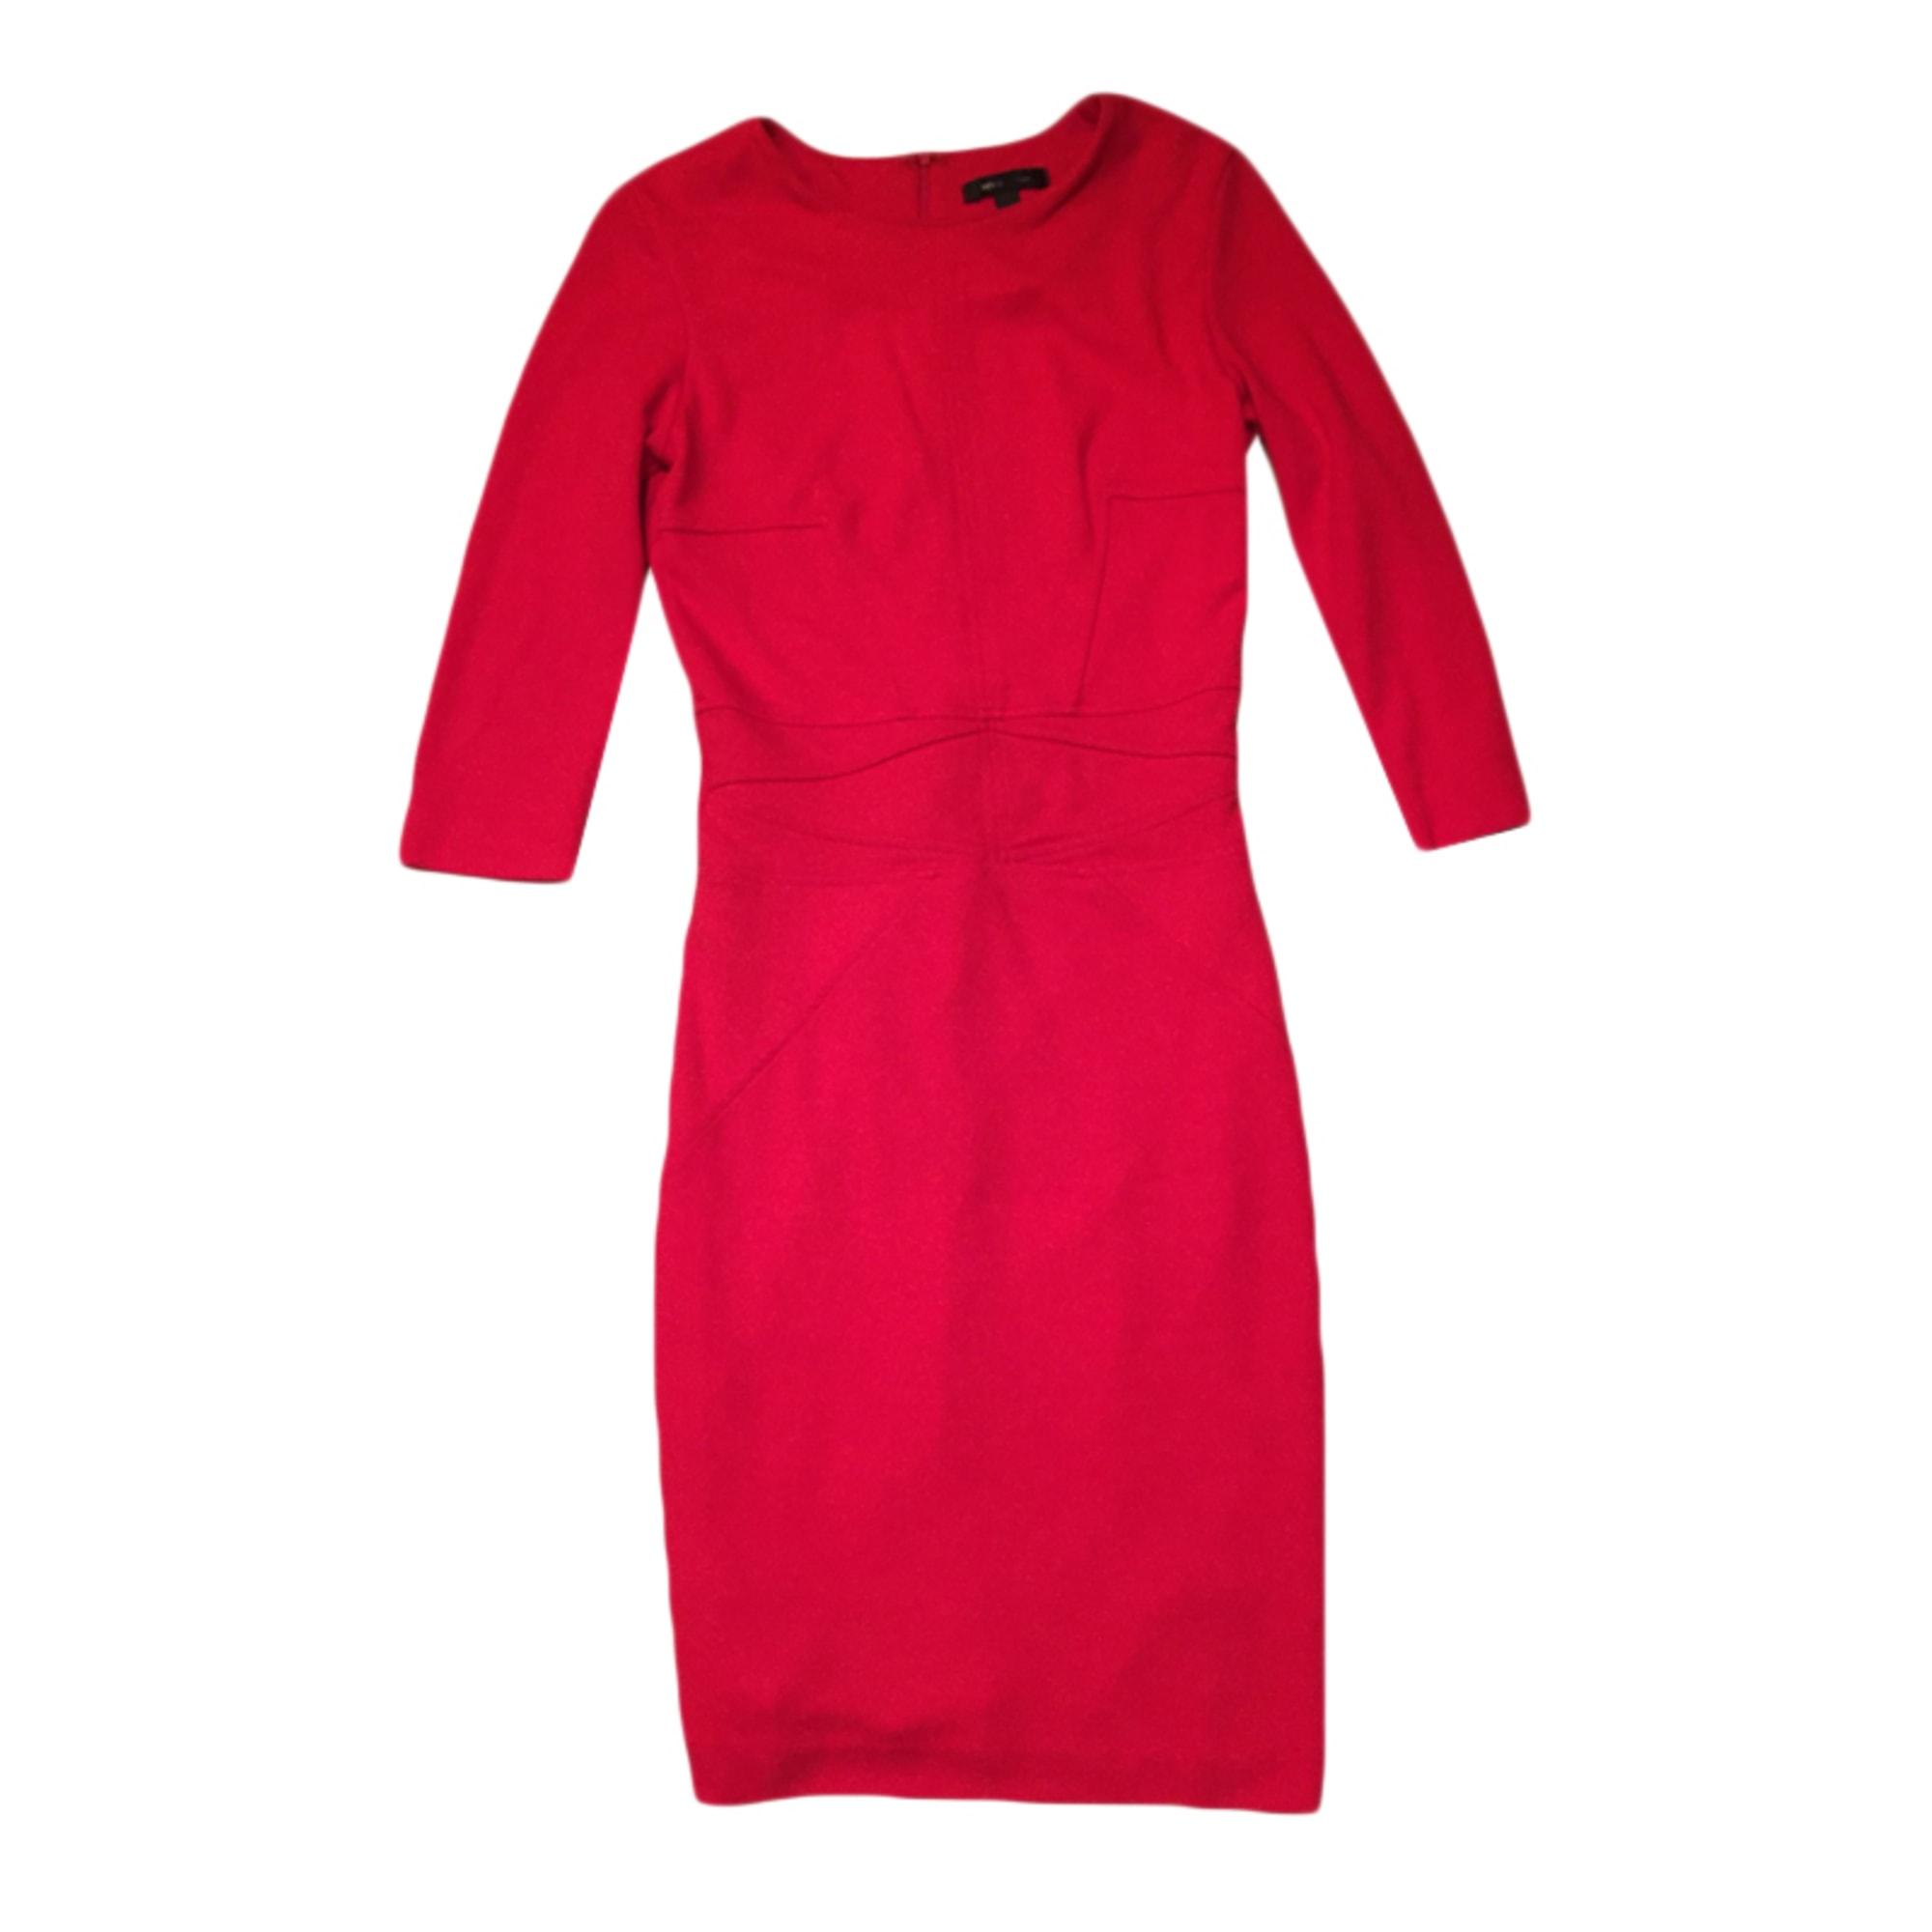 Robe courte MANGO 34 (XS, T0) rouge - 4028016 514b01e0e22b